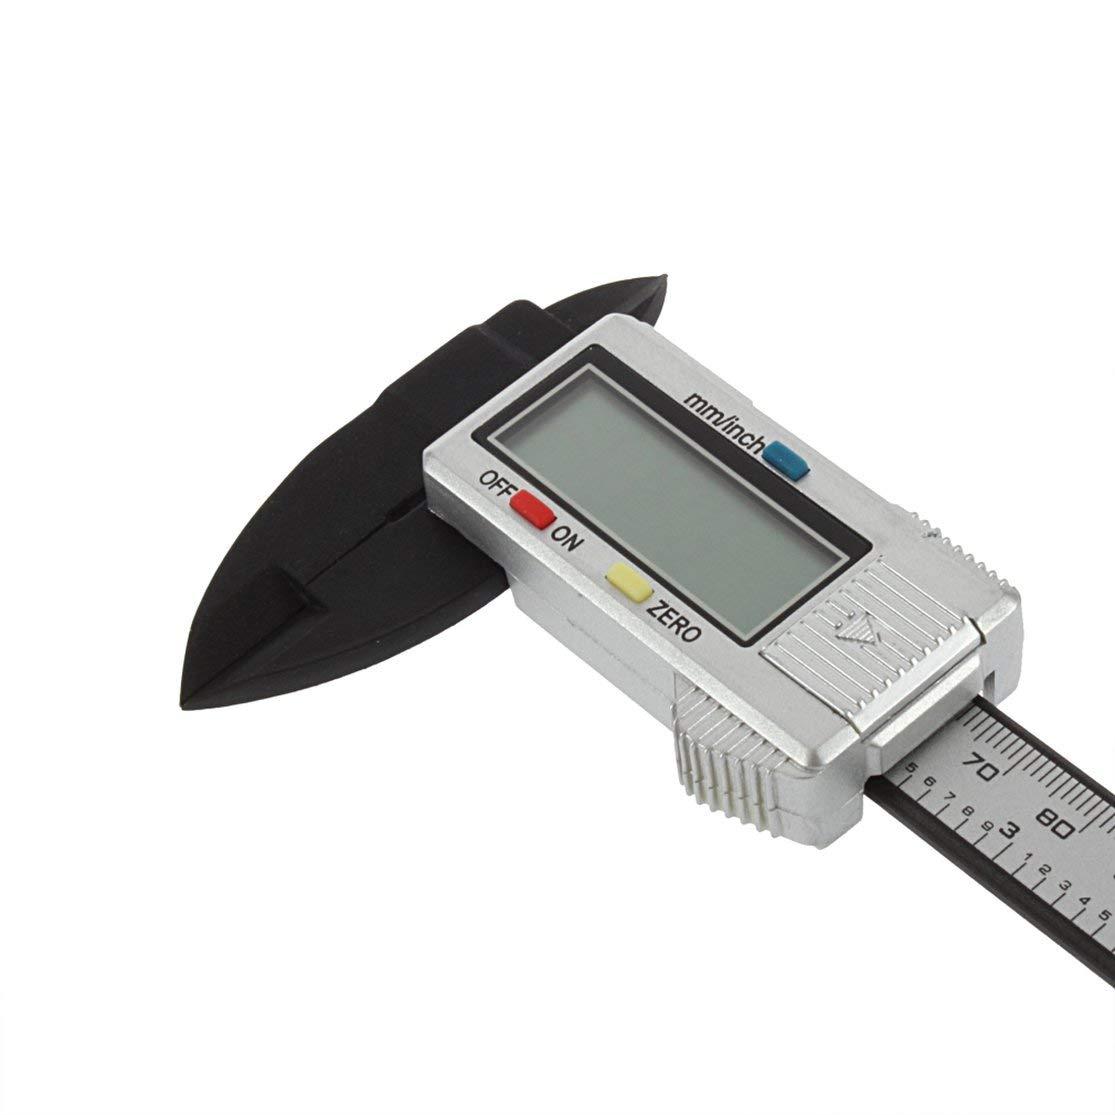 LouiseEvel215 6 Inch Carbon Fiber Composite Electronic Digital Vernier Caliper Rule Durable Micrometer Universal Measuring Tool